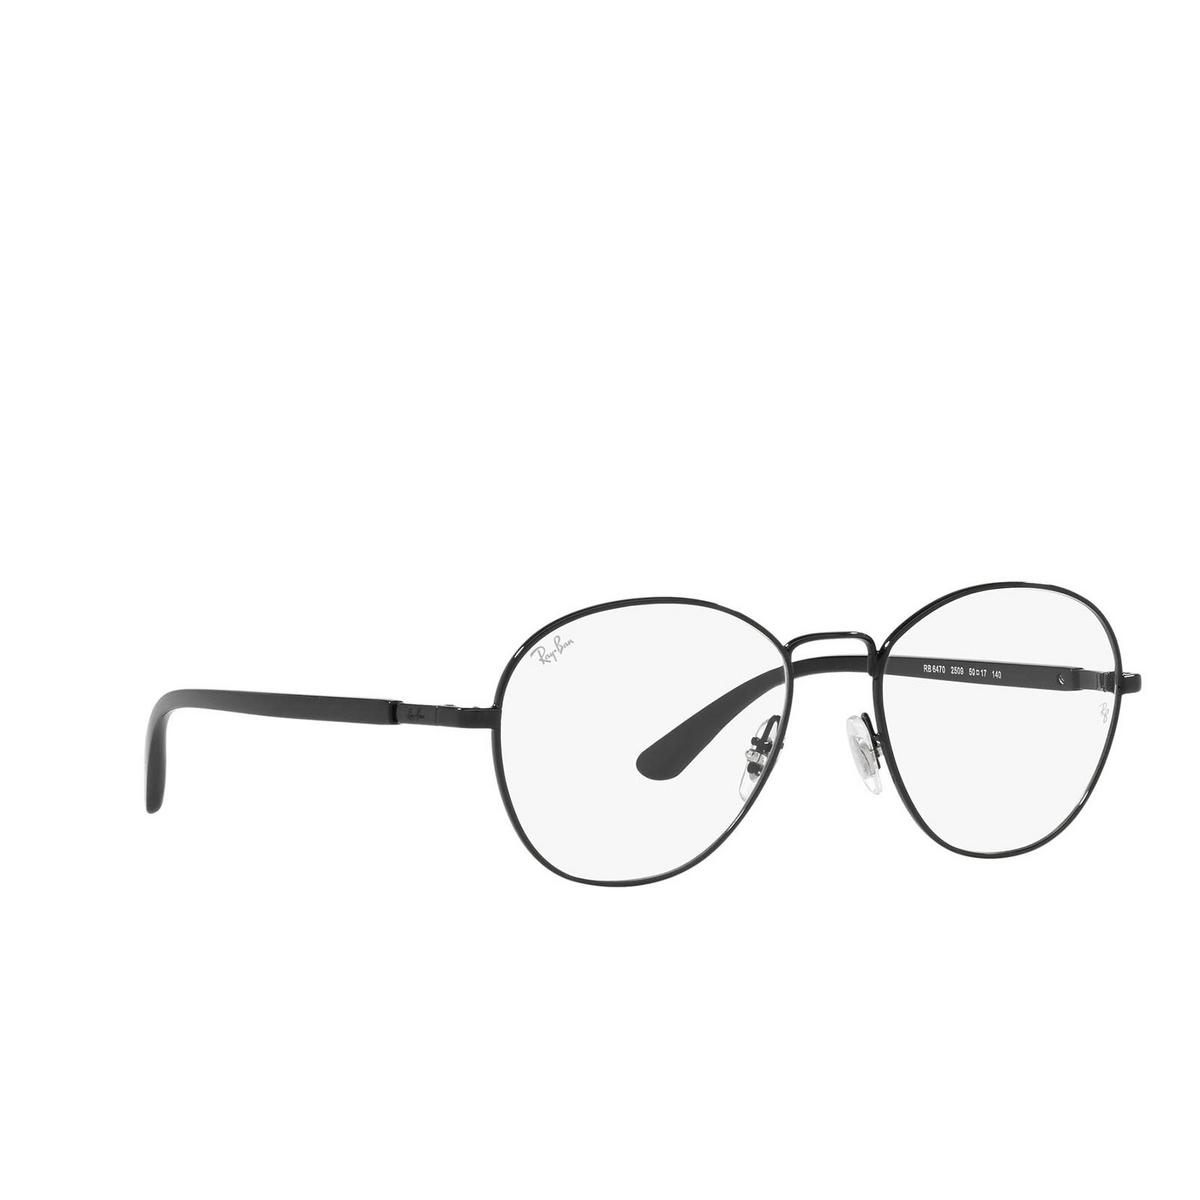 Ray-Ban® Irregular Eyeglasses: RX6470 color Black 2509.